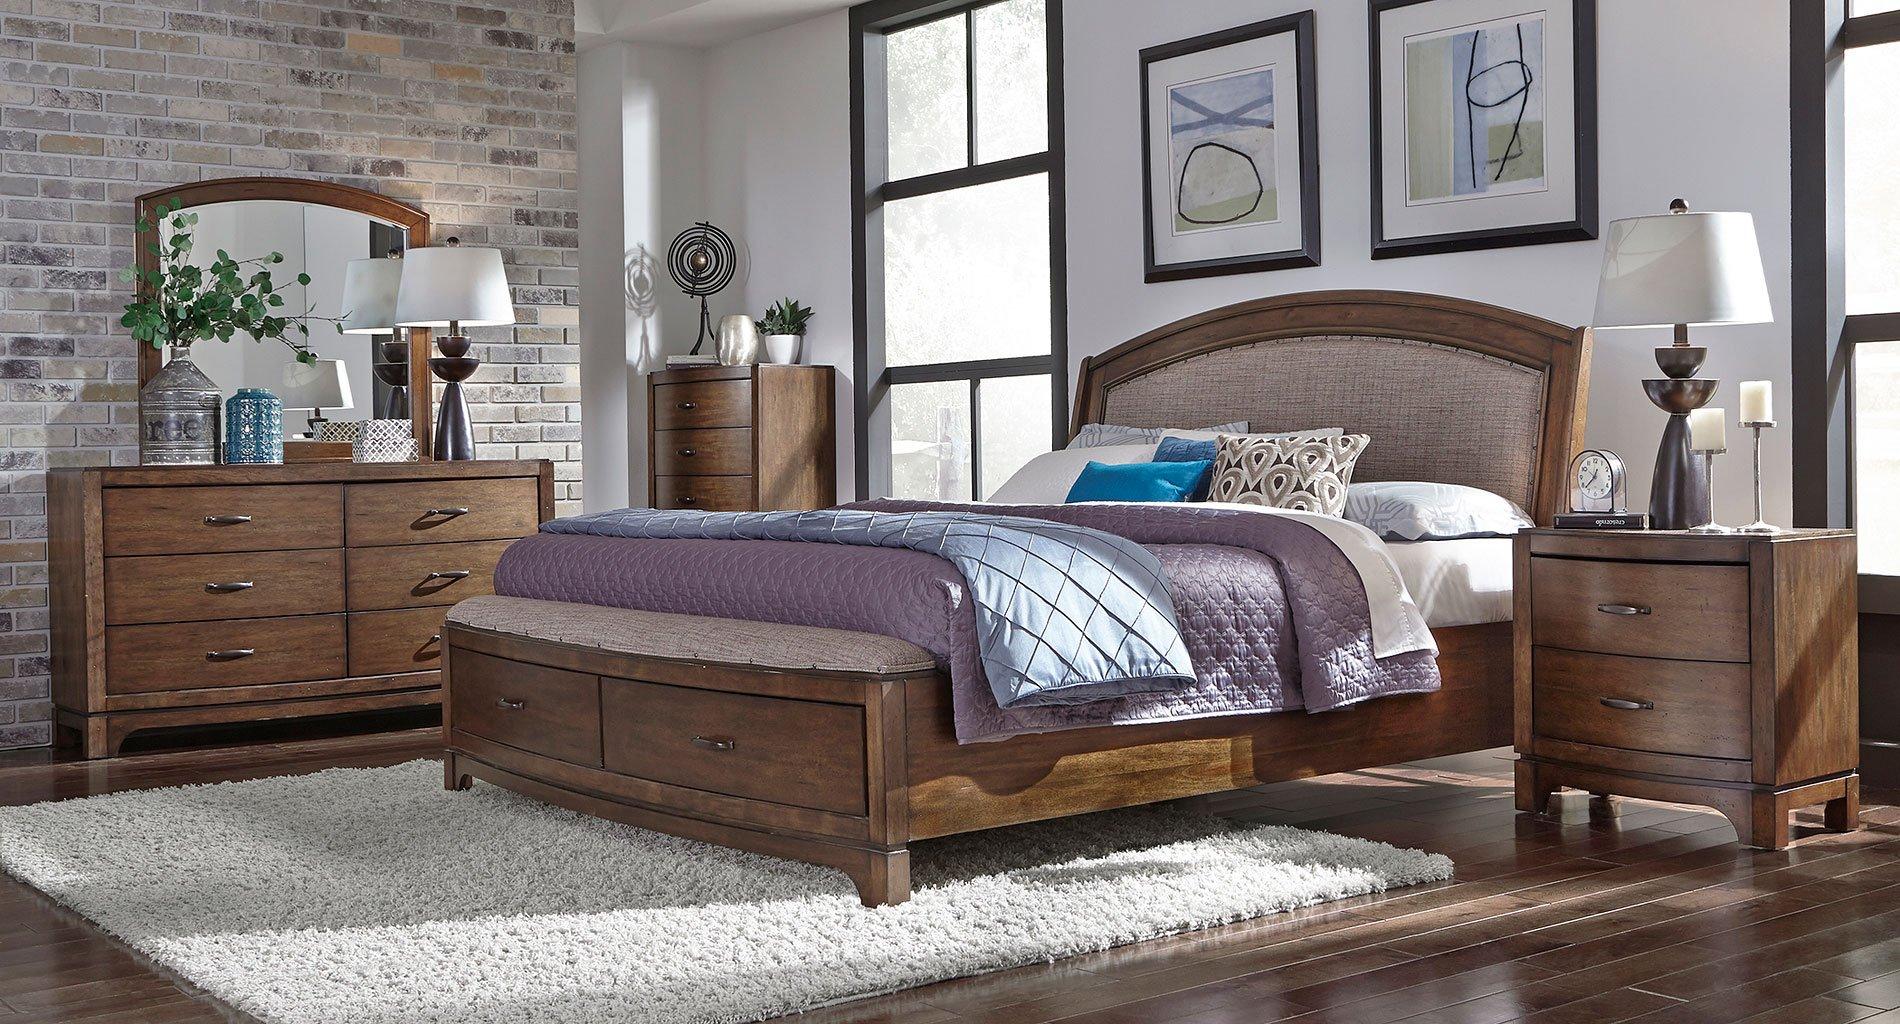 Avalon III Upholstered Storage Bedroom Set Liberty